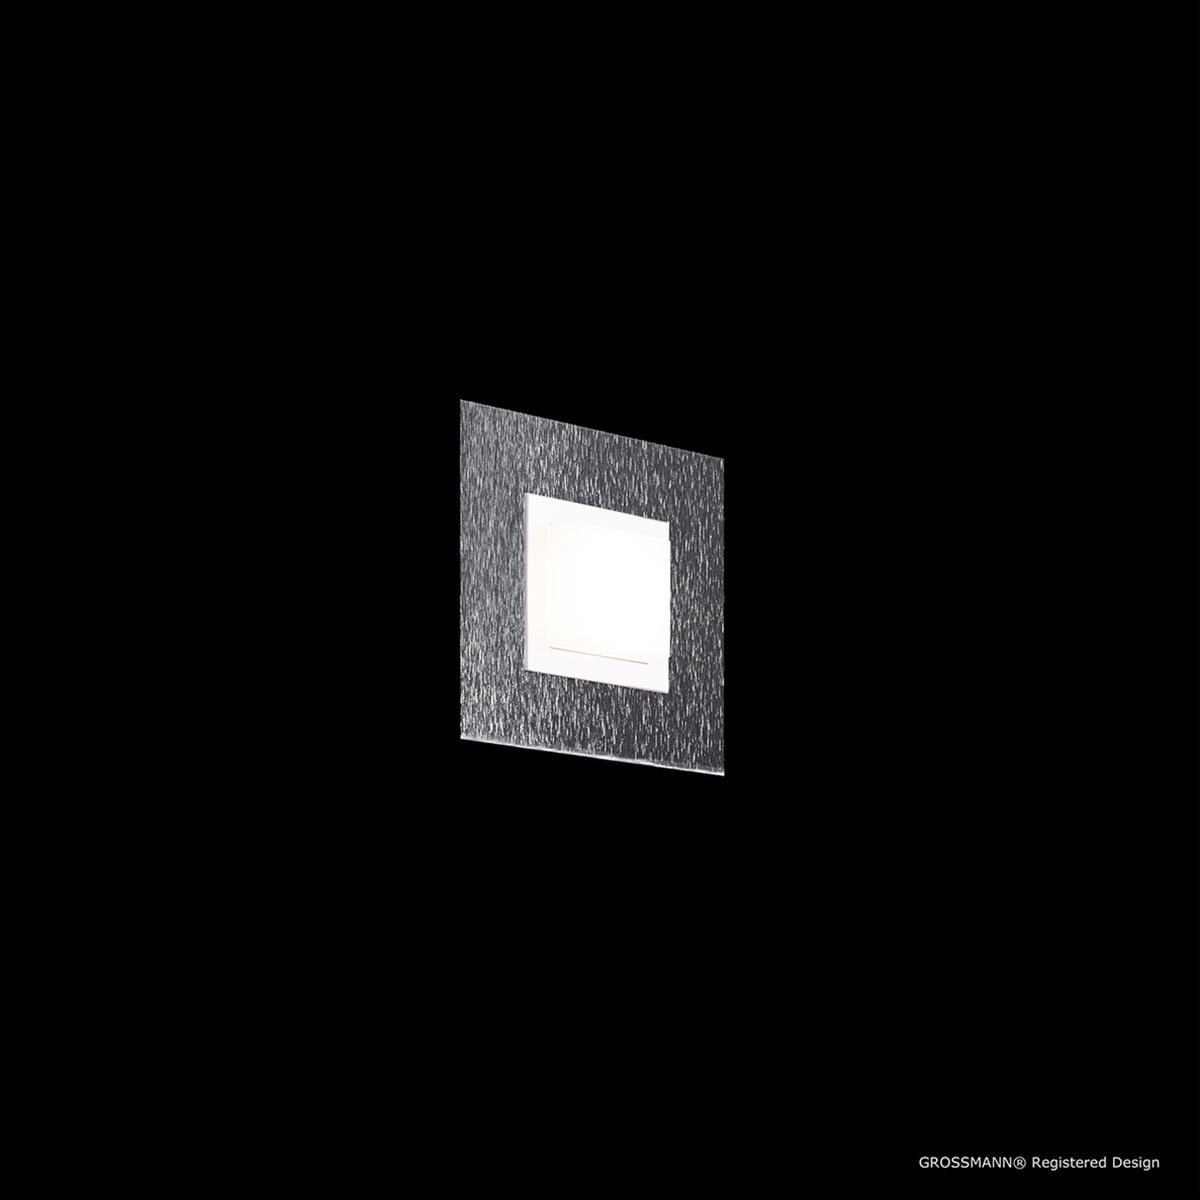 Grossmann Basic LED Wandleuchte 51-790-019